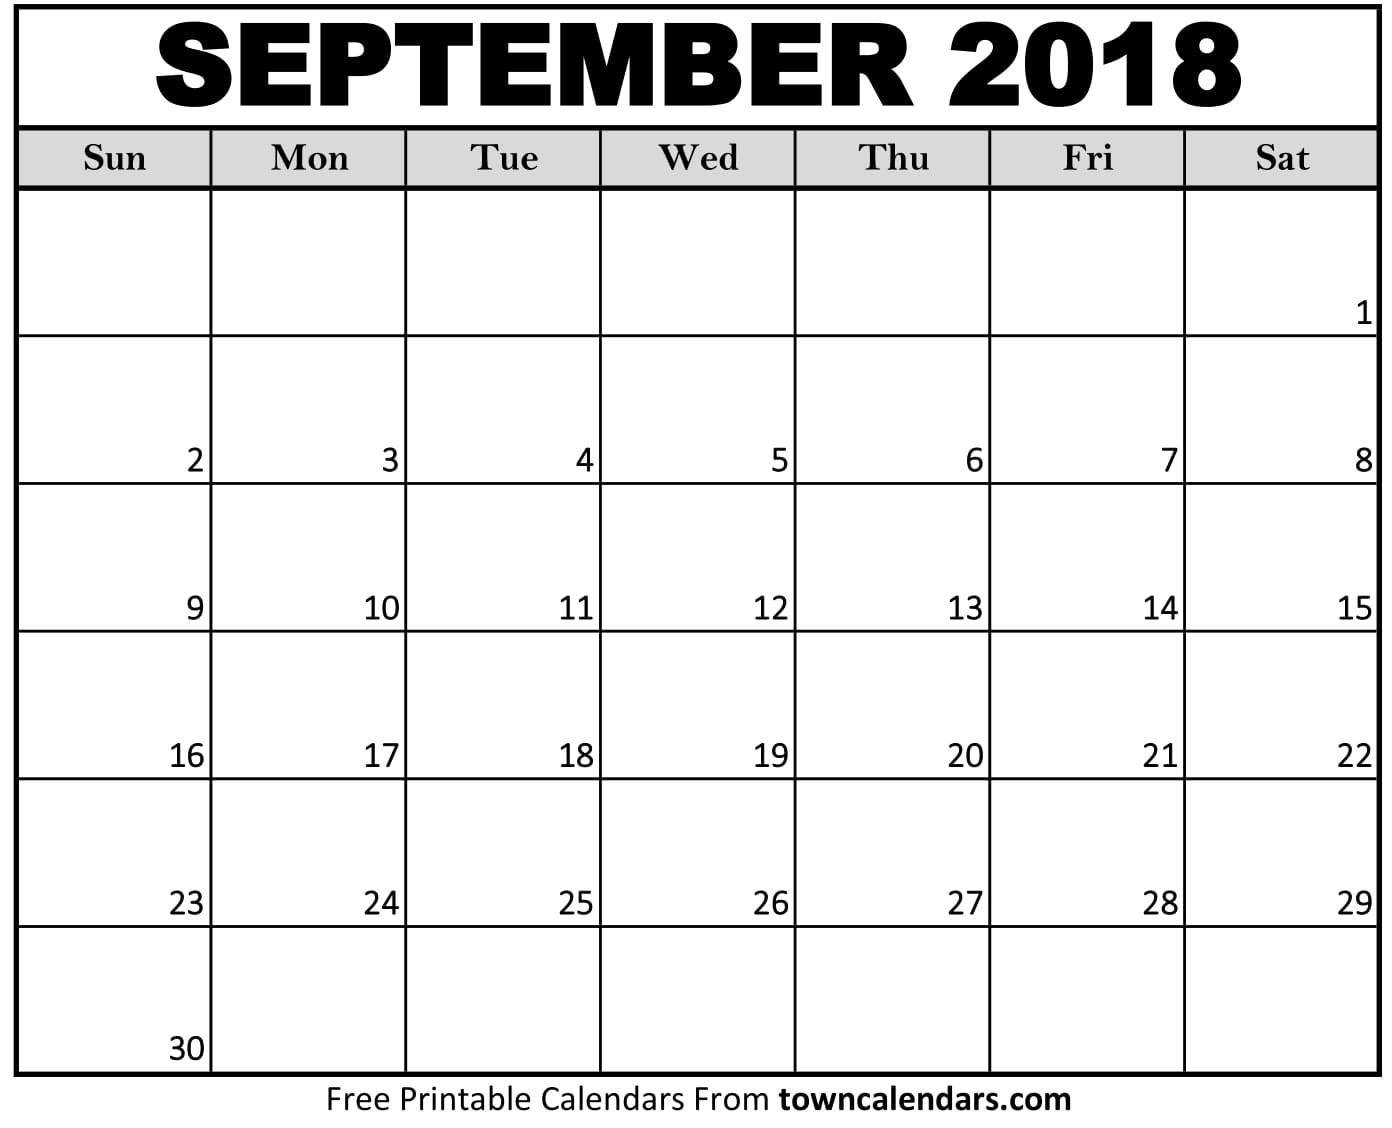 Printable September 2018 Calendar towncalendars